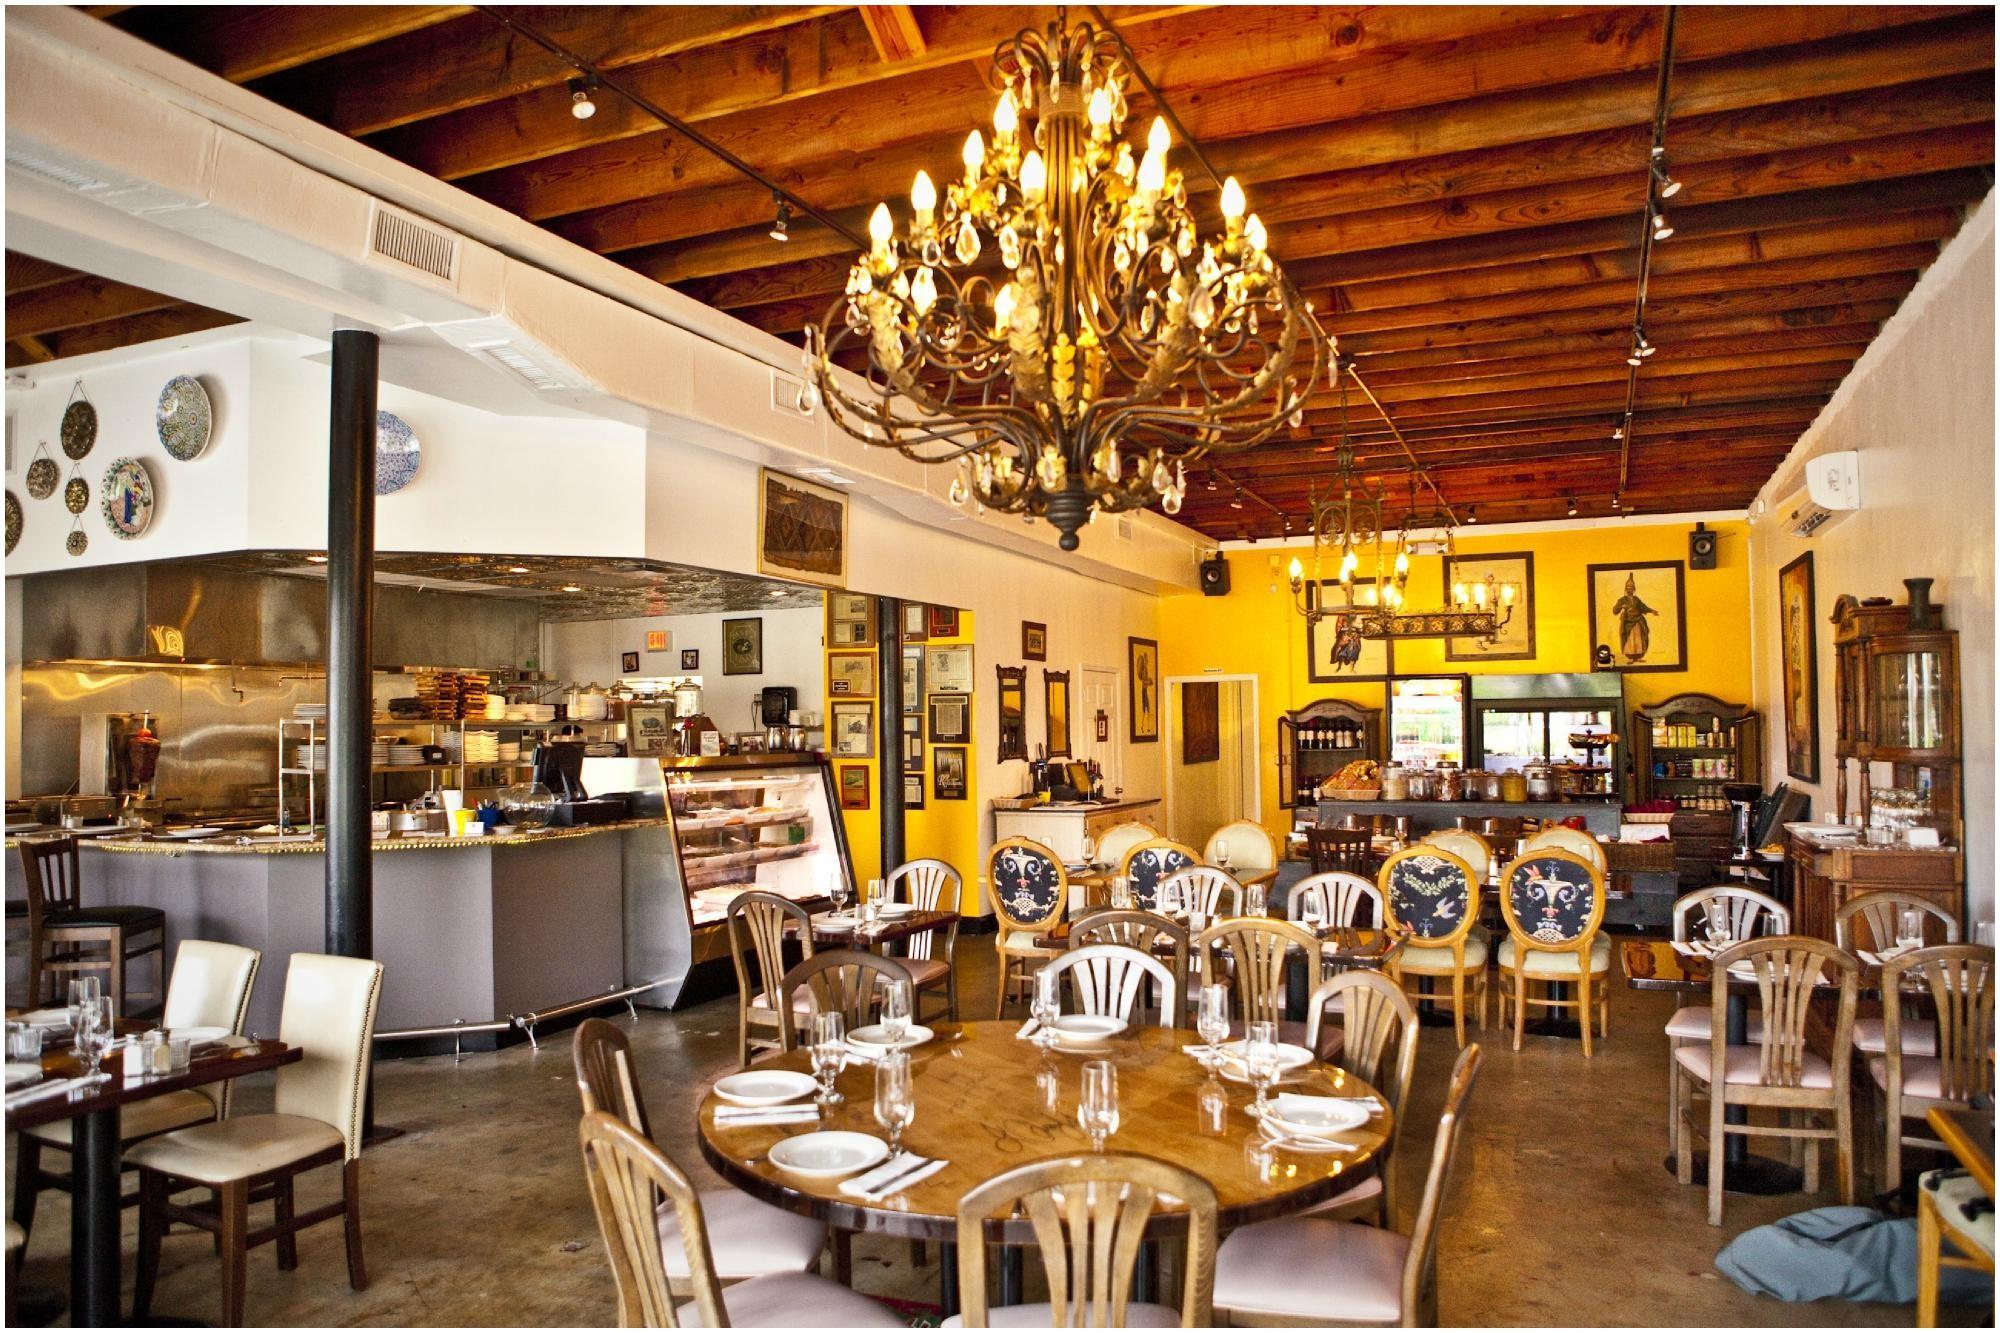 Best Italian Restaurants In Boynton Beach Florida